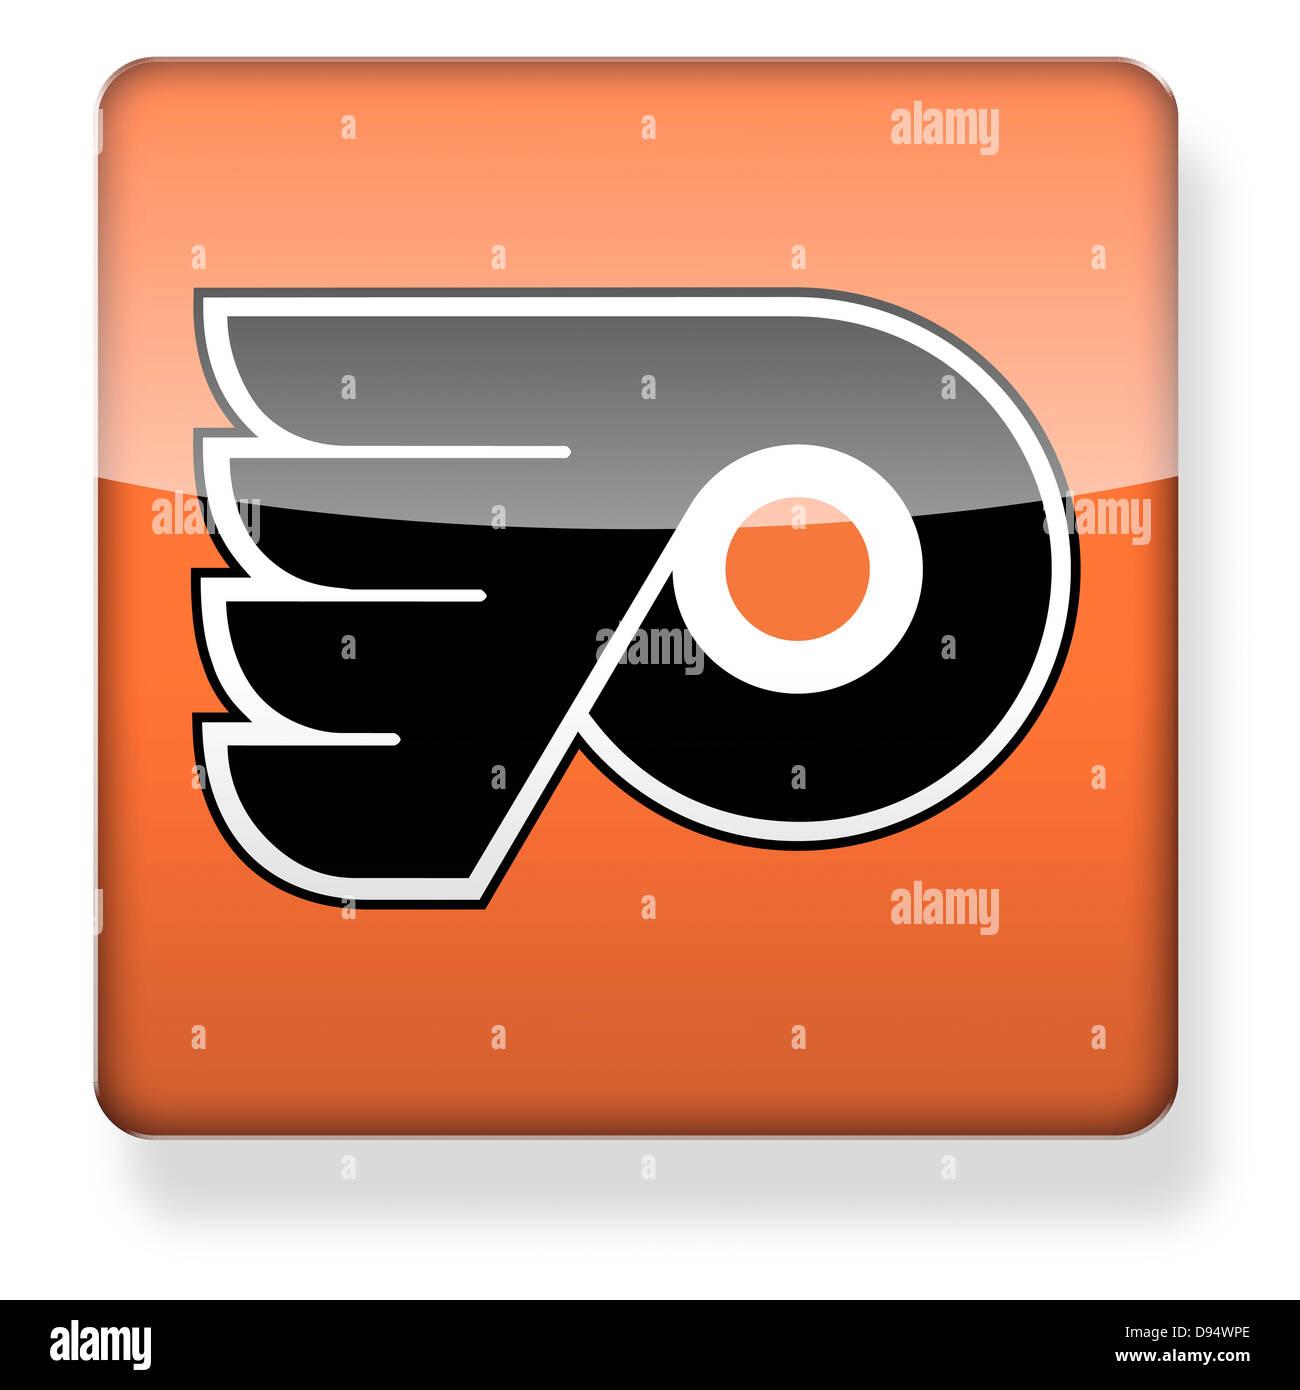 philadelphia flyers hockey team logo as an app icon clipping path